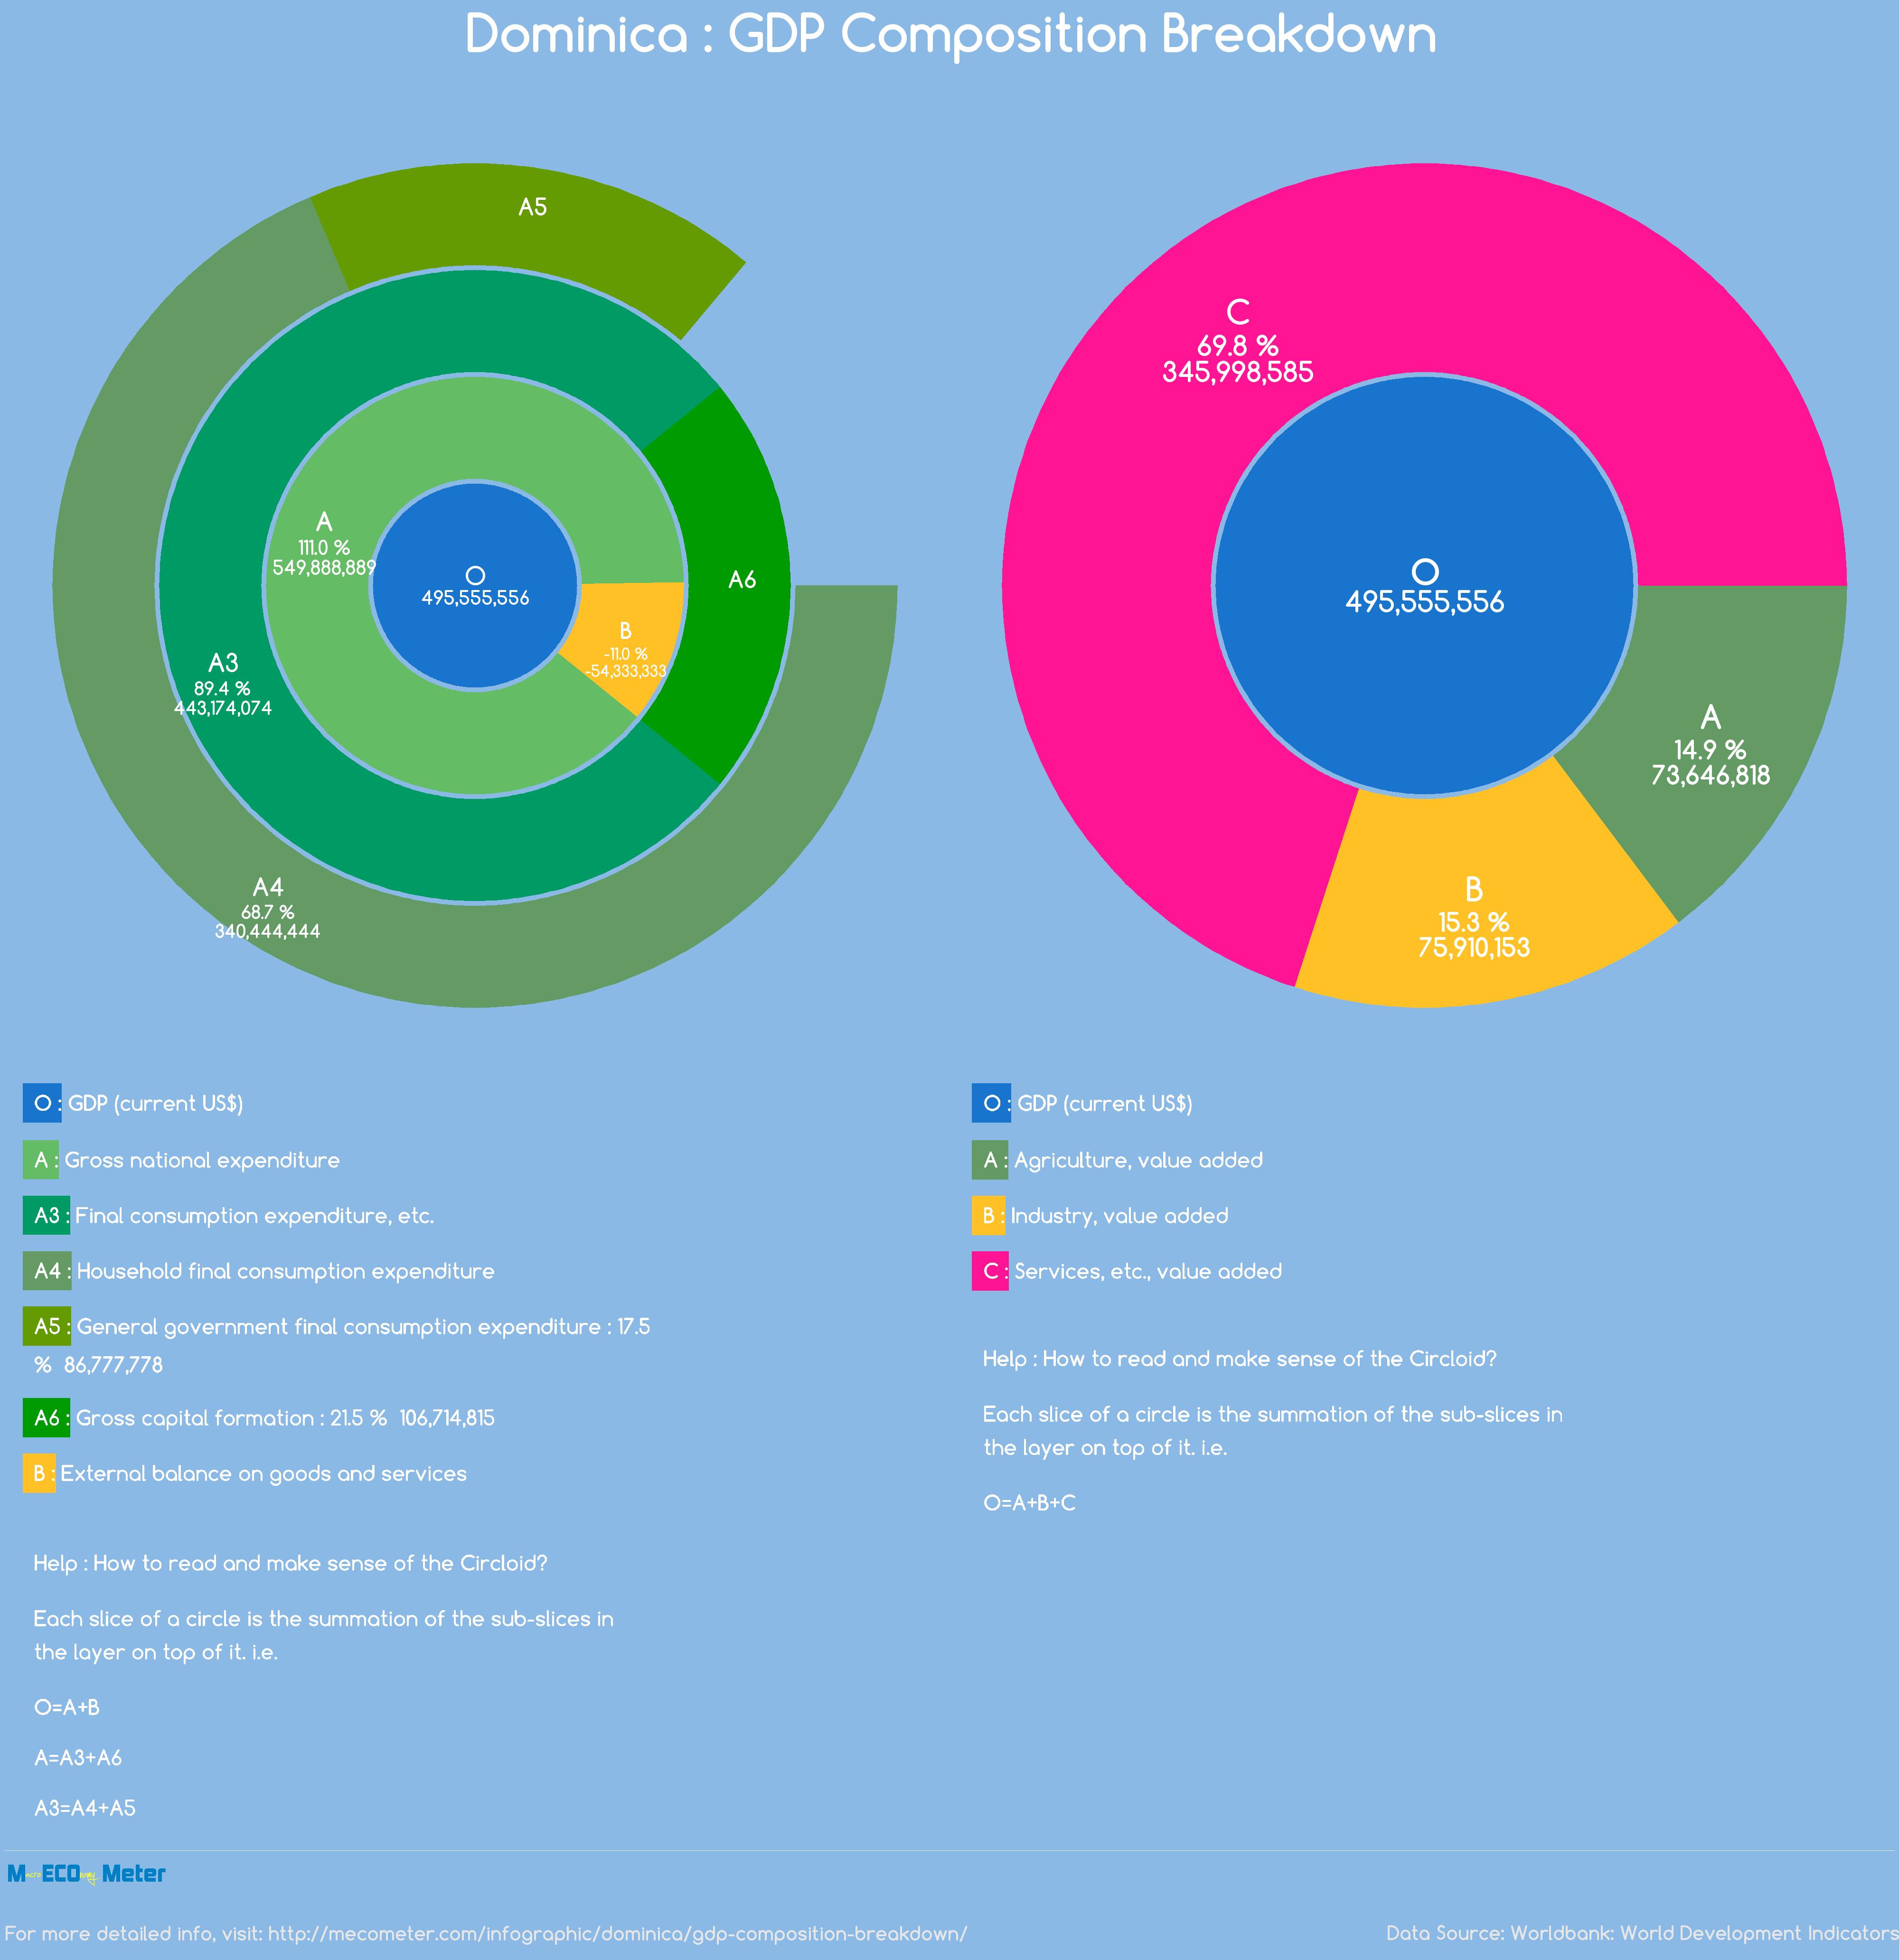 Dominica : GDP Composition Breakdown